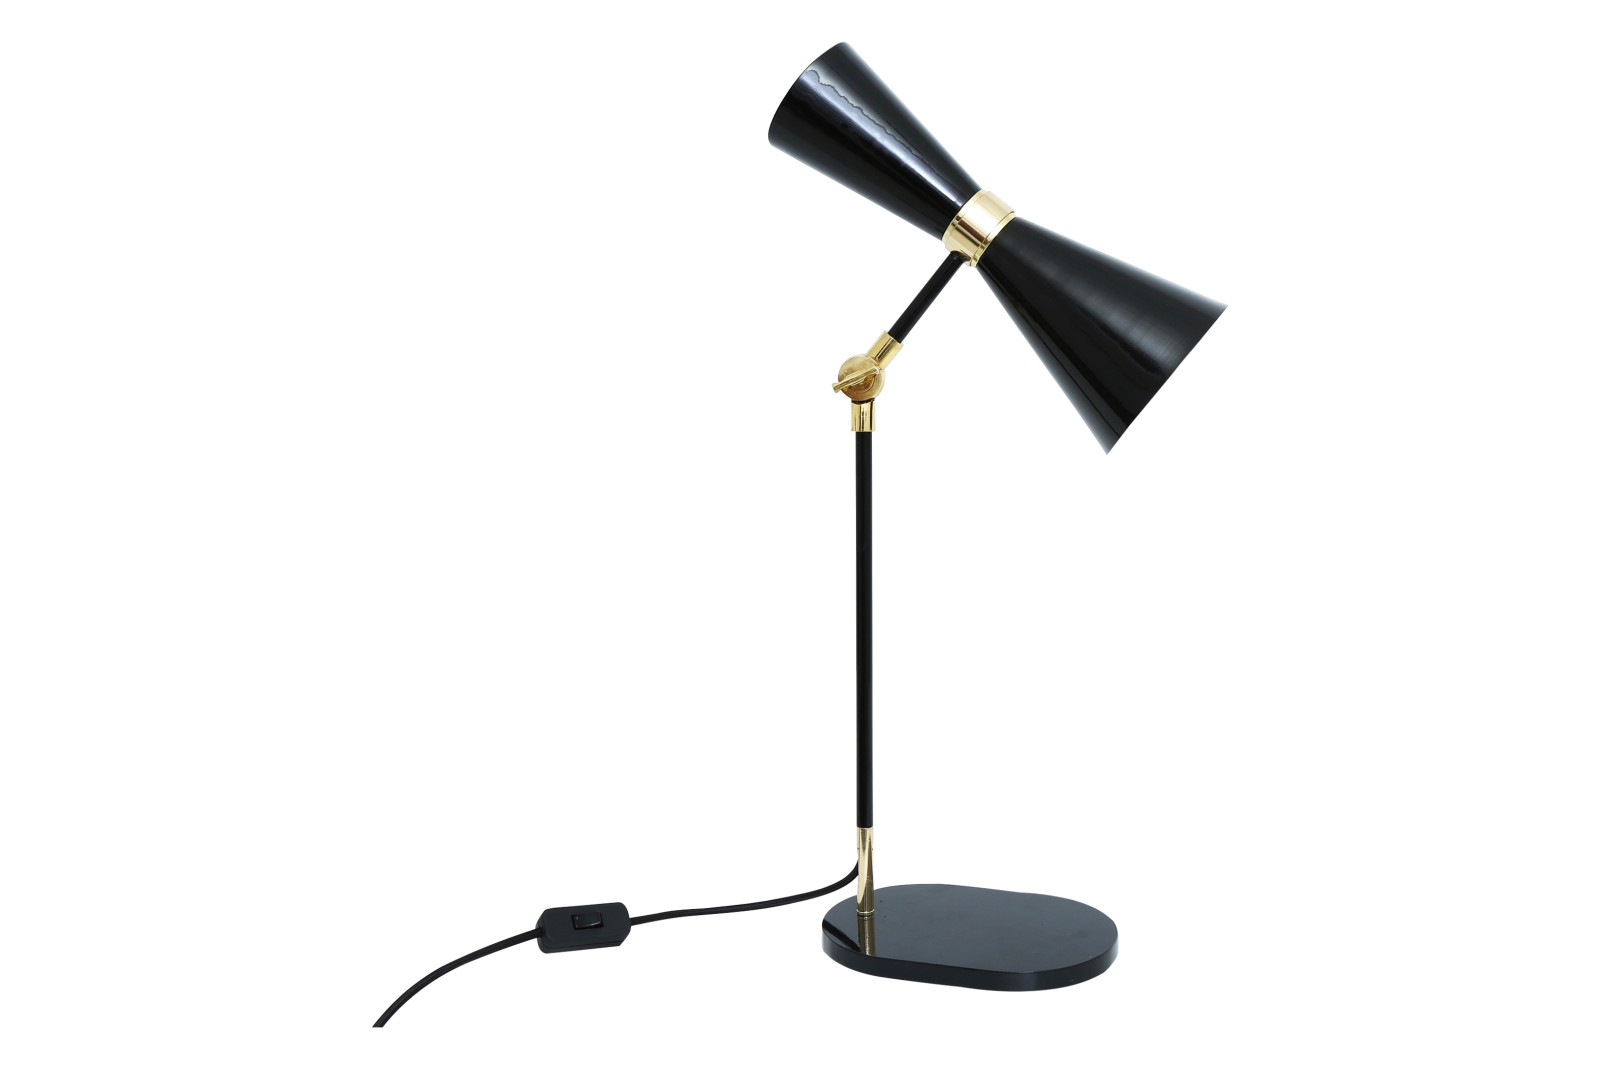 Cairo Table Lamp Powder Coated Matte Black, UK Plug